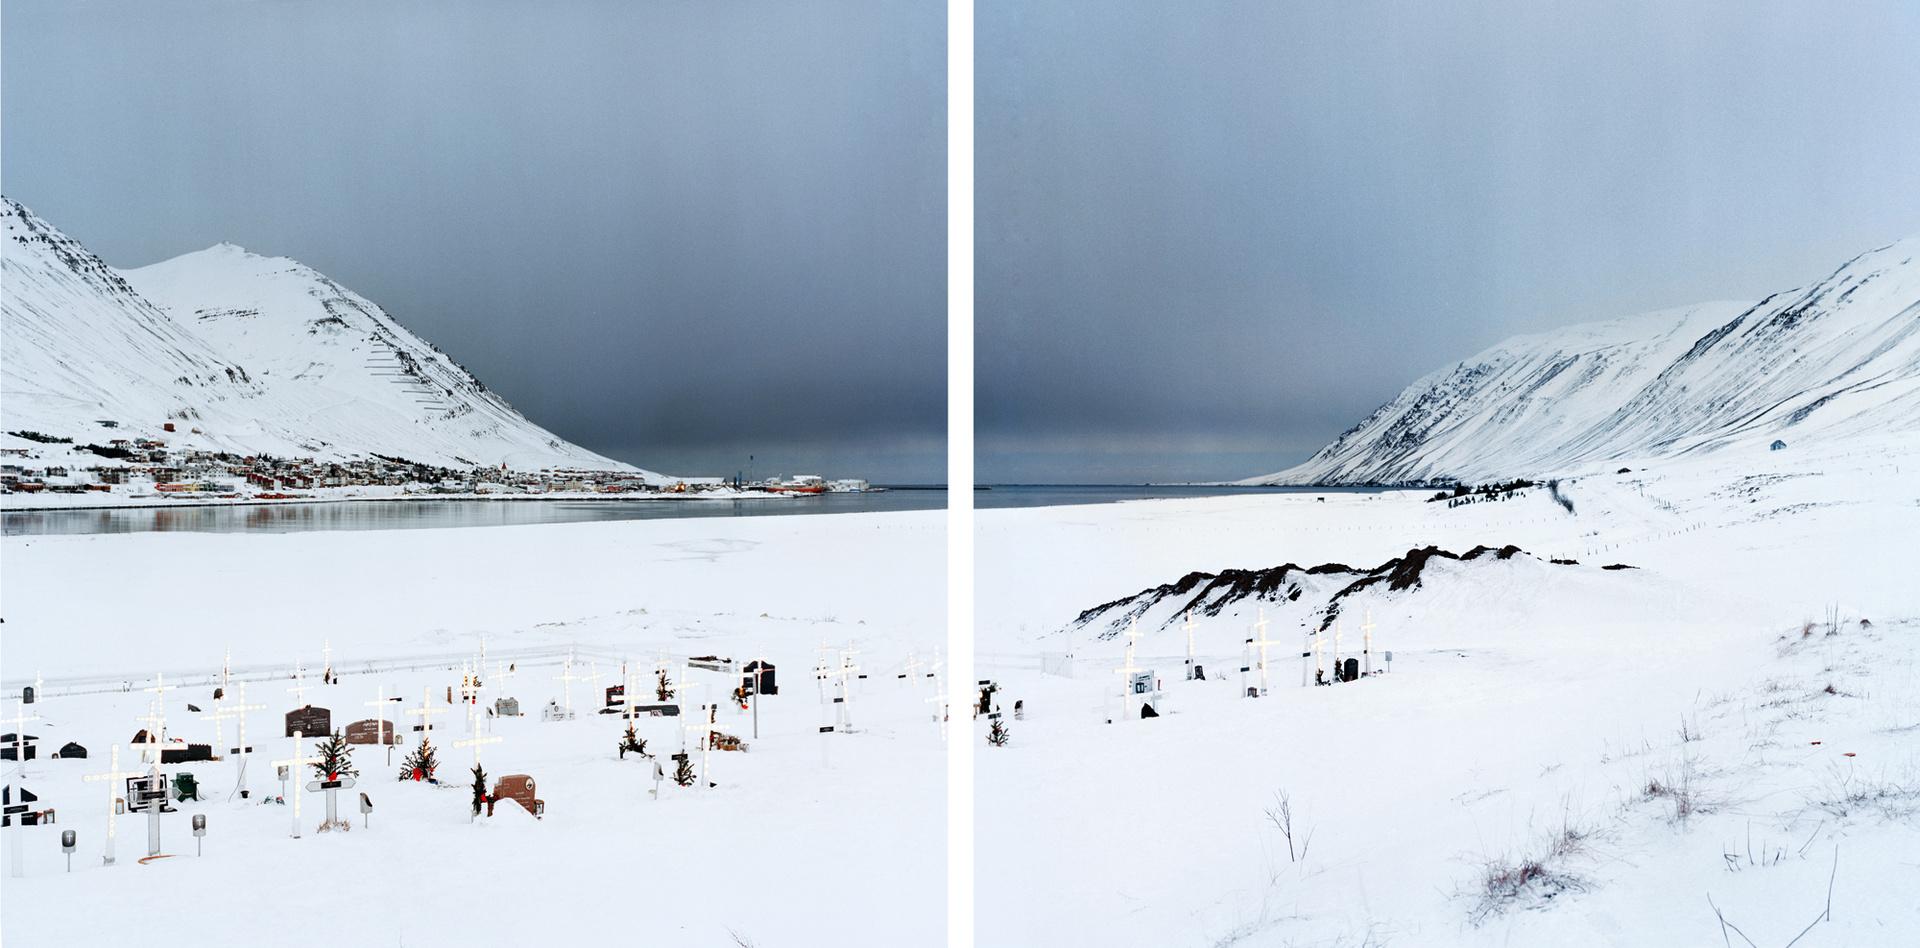 Iceland - Siglufjör∂ur